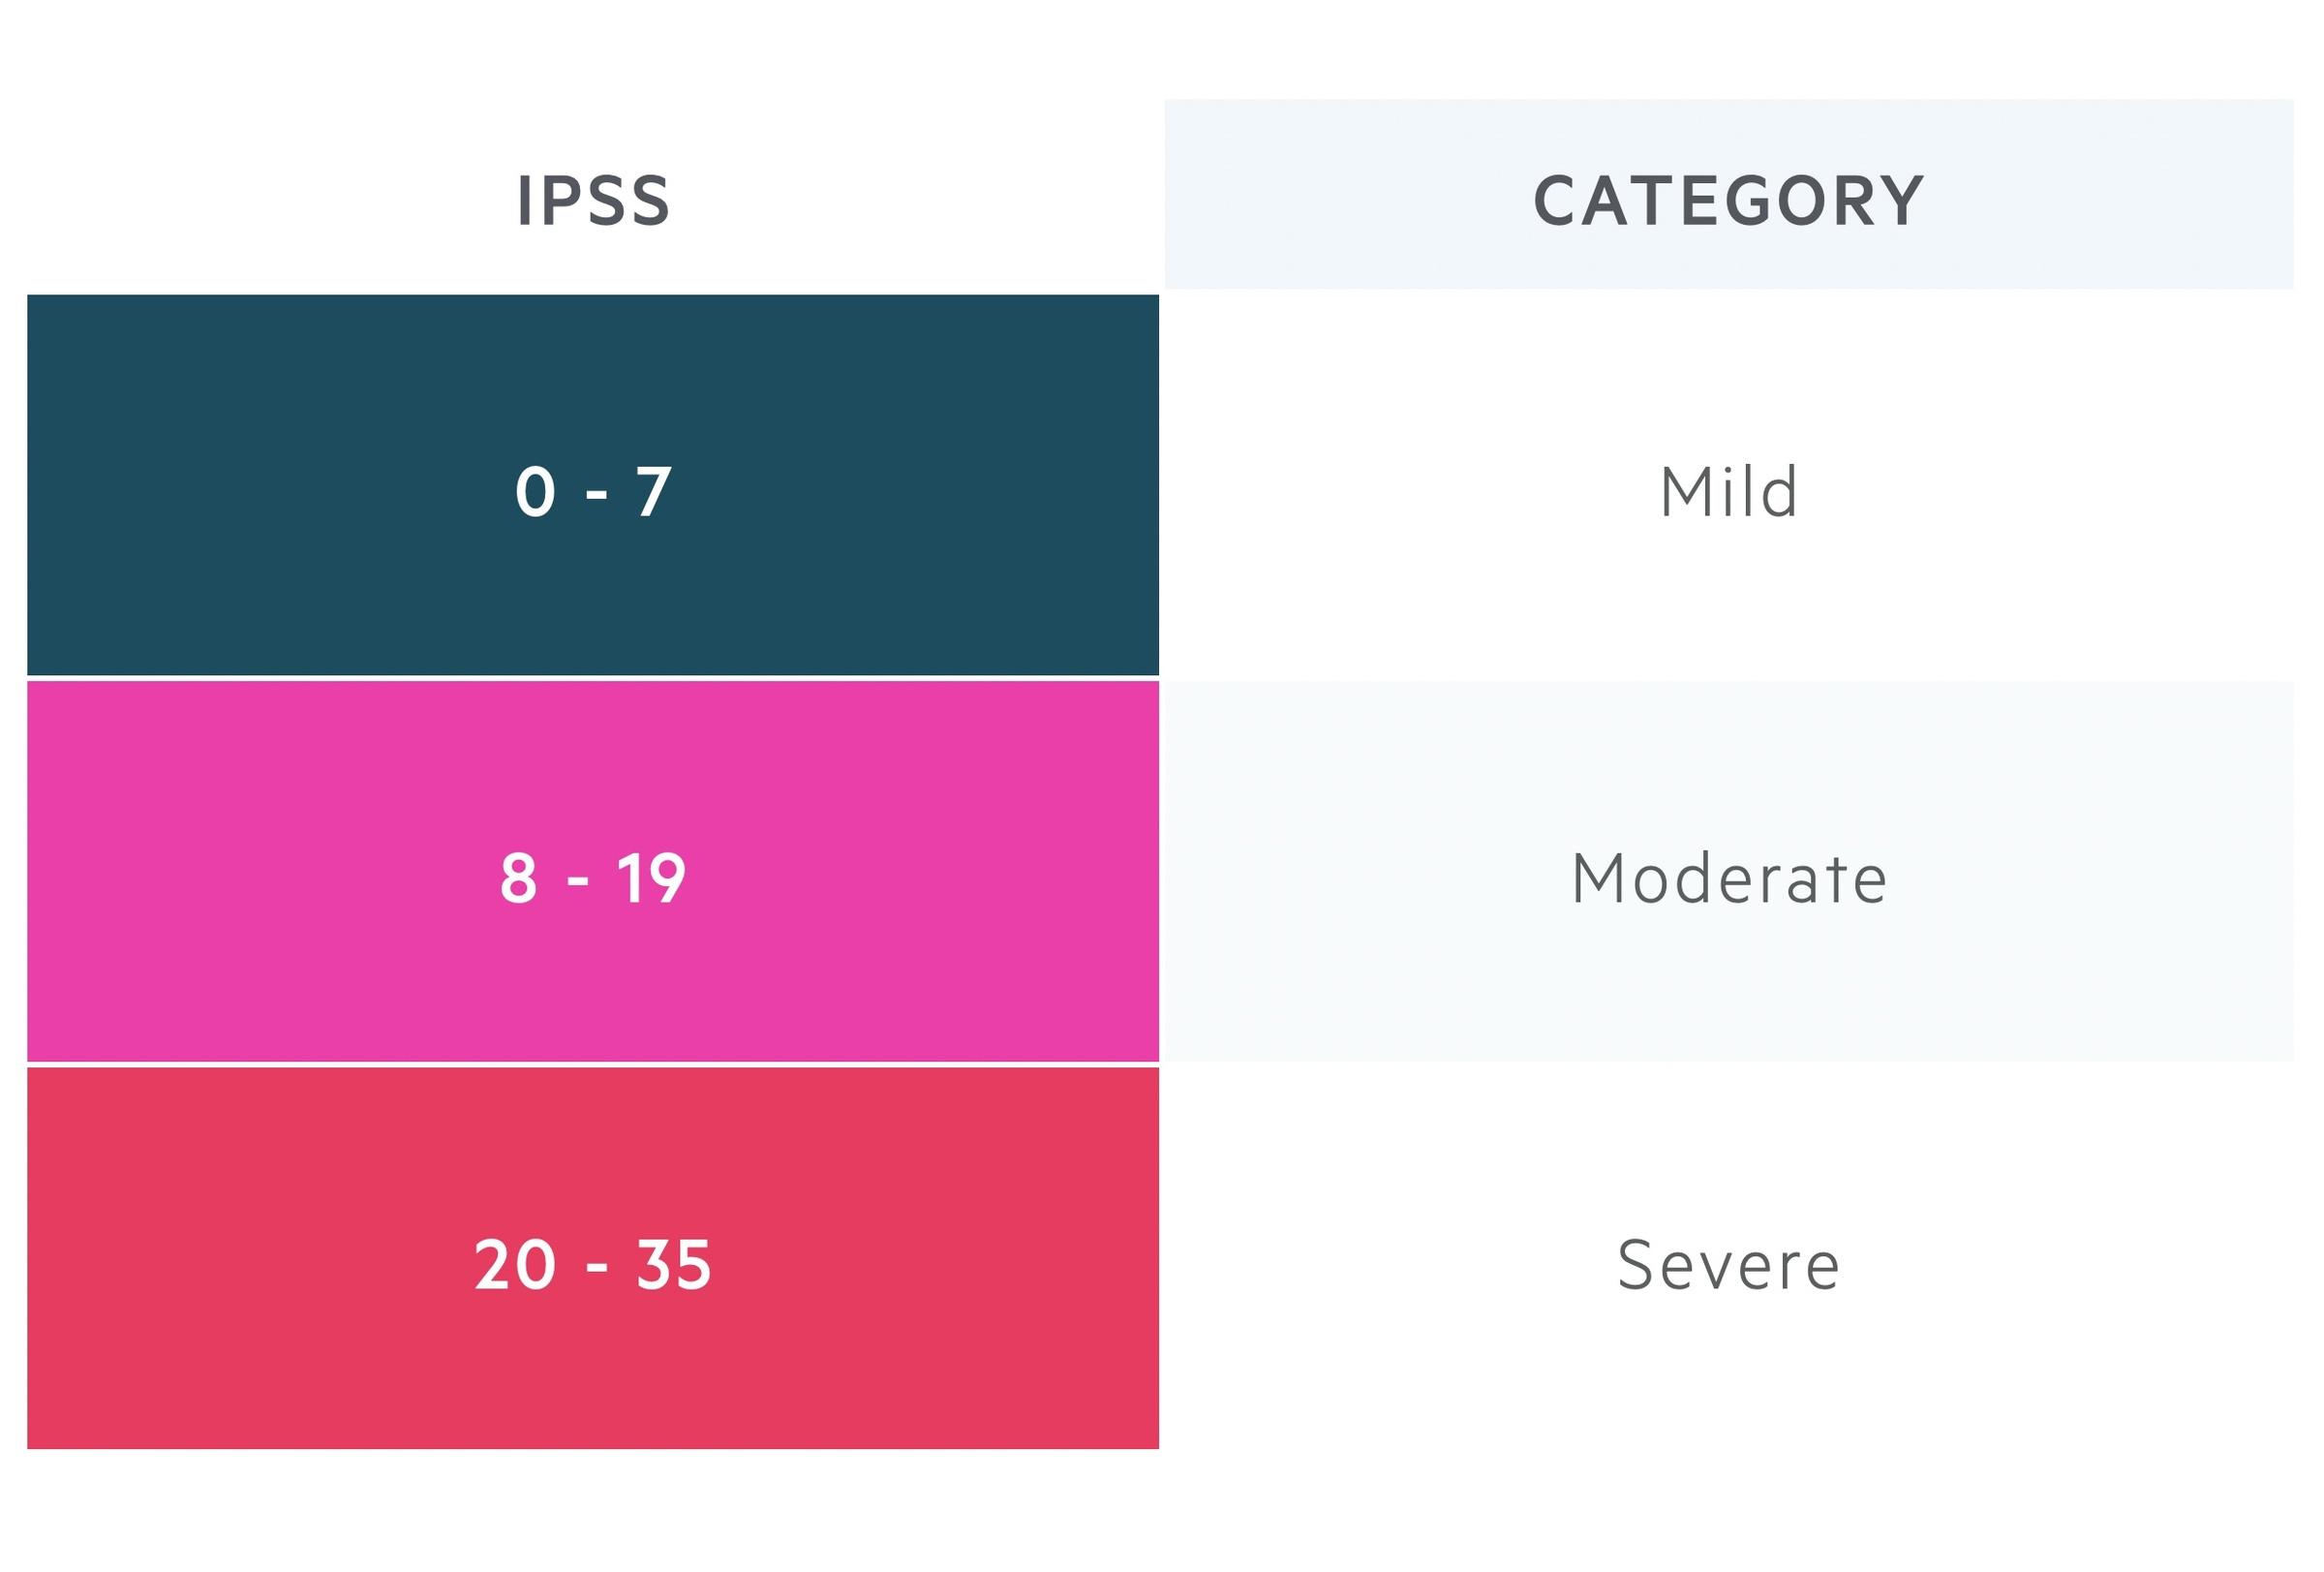 IPSS score